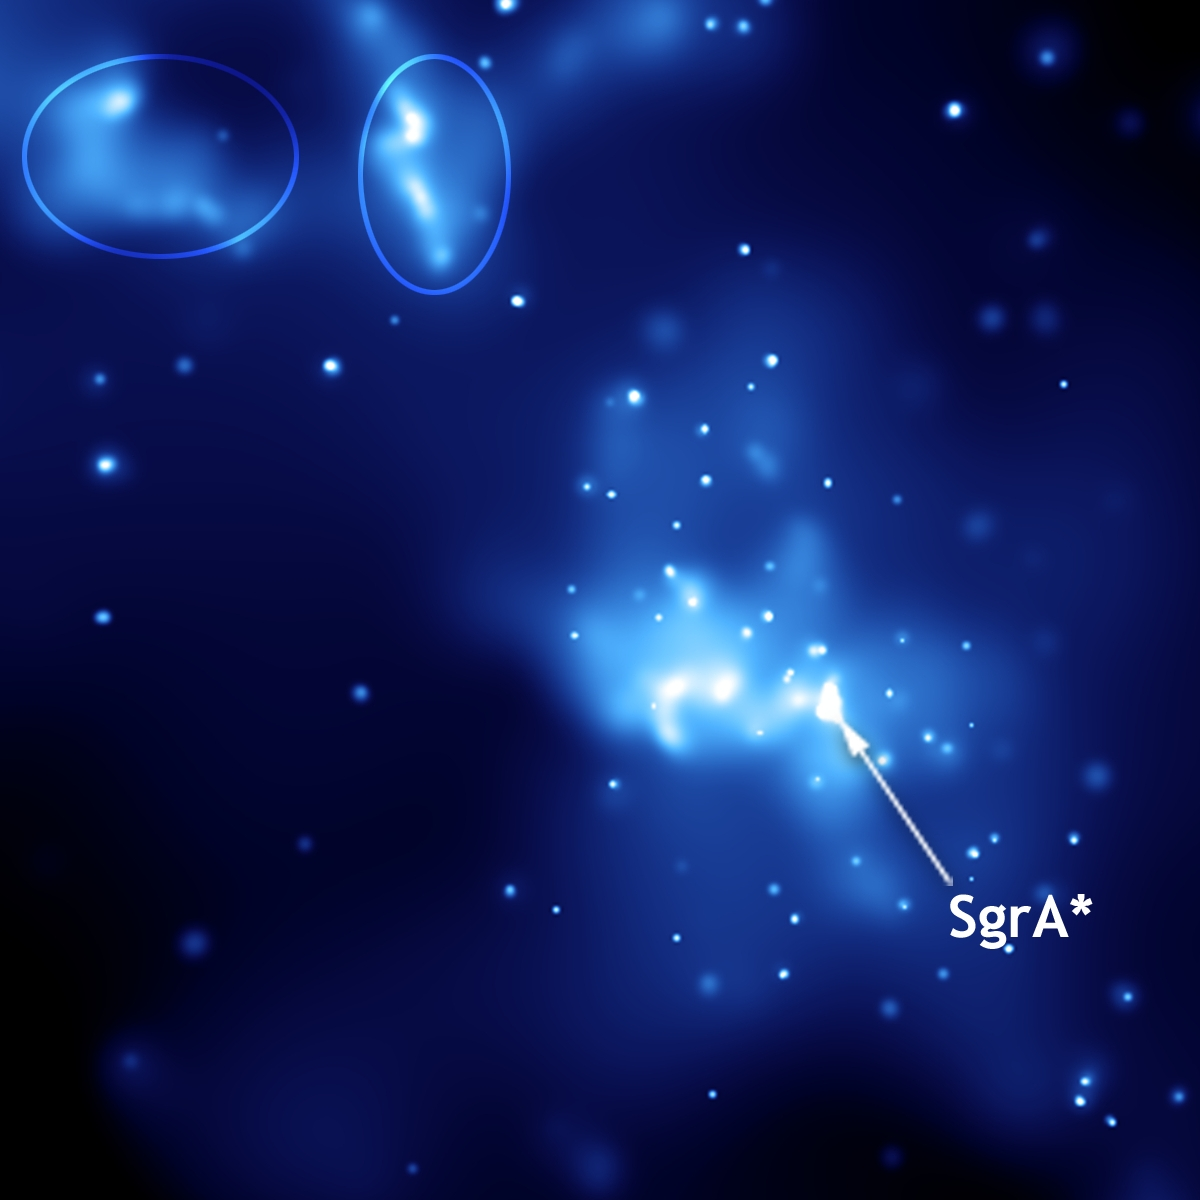 Sagittarius A*, taken by NASA's Chandra X-Ray Observatory. Ellipses indicate light echoes. NASAチャンドラX線宇宙望遠鏡が撮影した、いて座A*(Sgr A*)。左上の楕円で囲まれた部分は、いて座A*が過去に放ったX線が周囲のガスに反射しているところ。 Credit: NASA/CXC/Caltech/M.Muno et al.